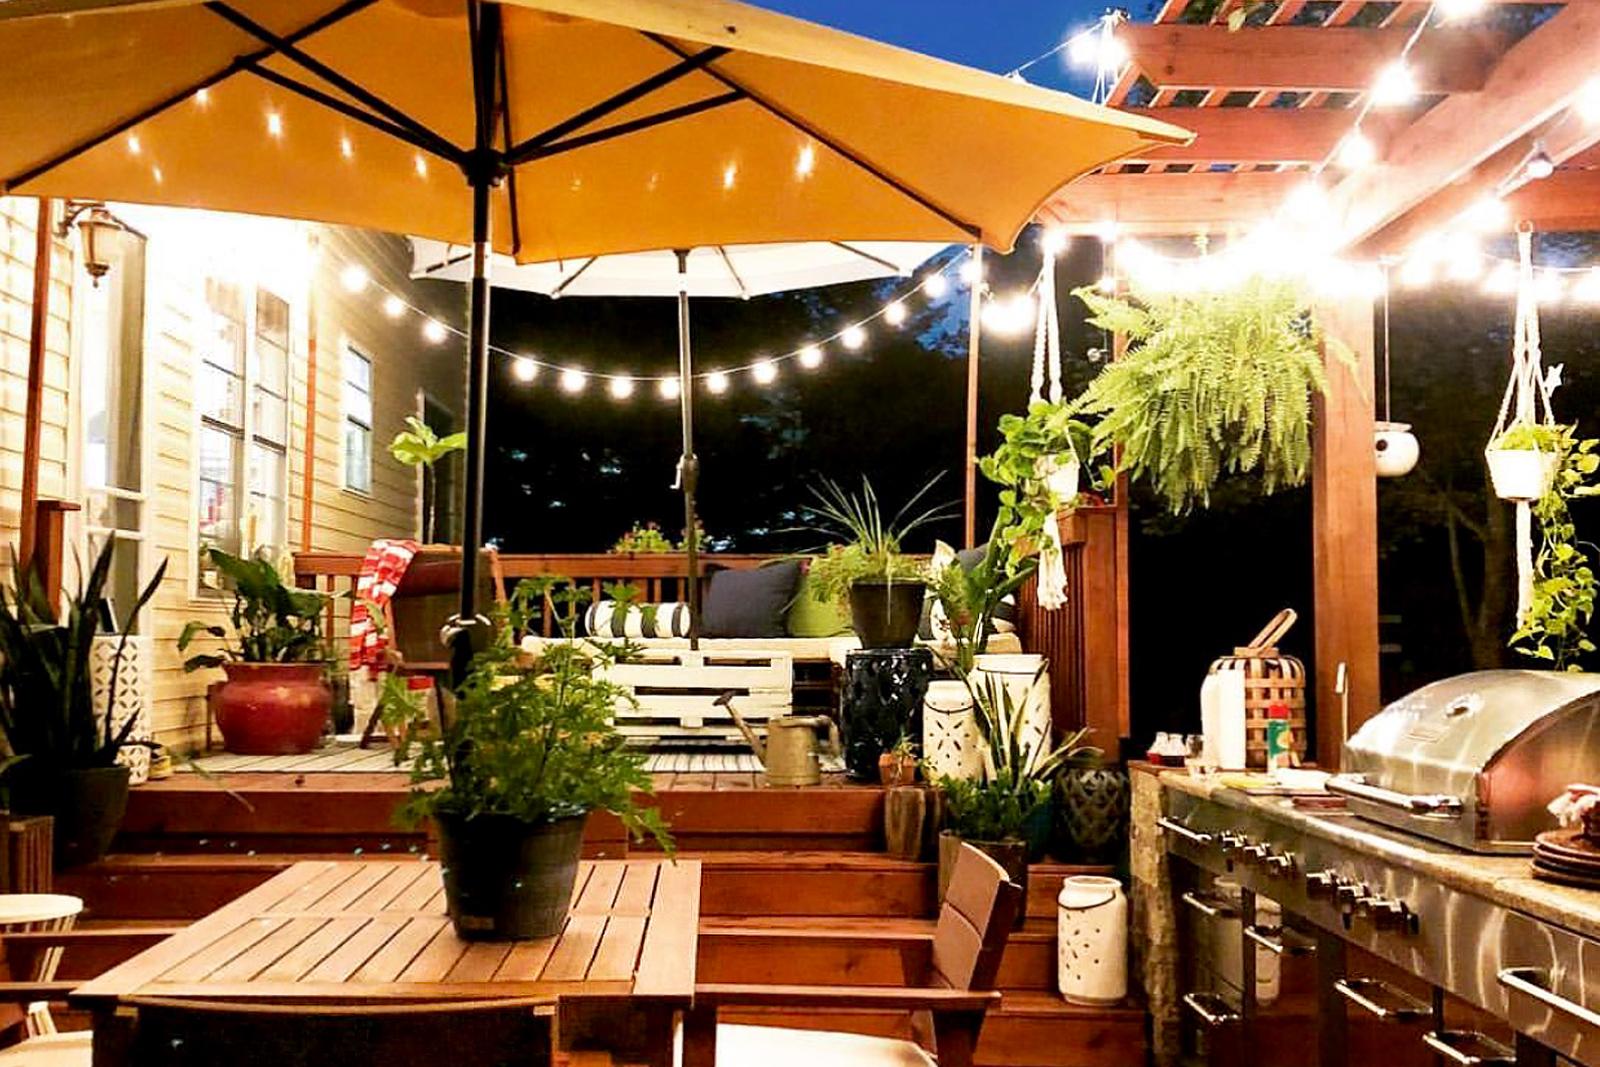 Outdoor Kitchen Building An Outdoor Kitchen Houselogic